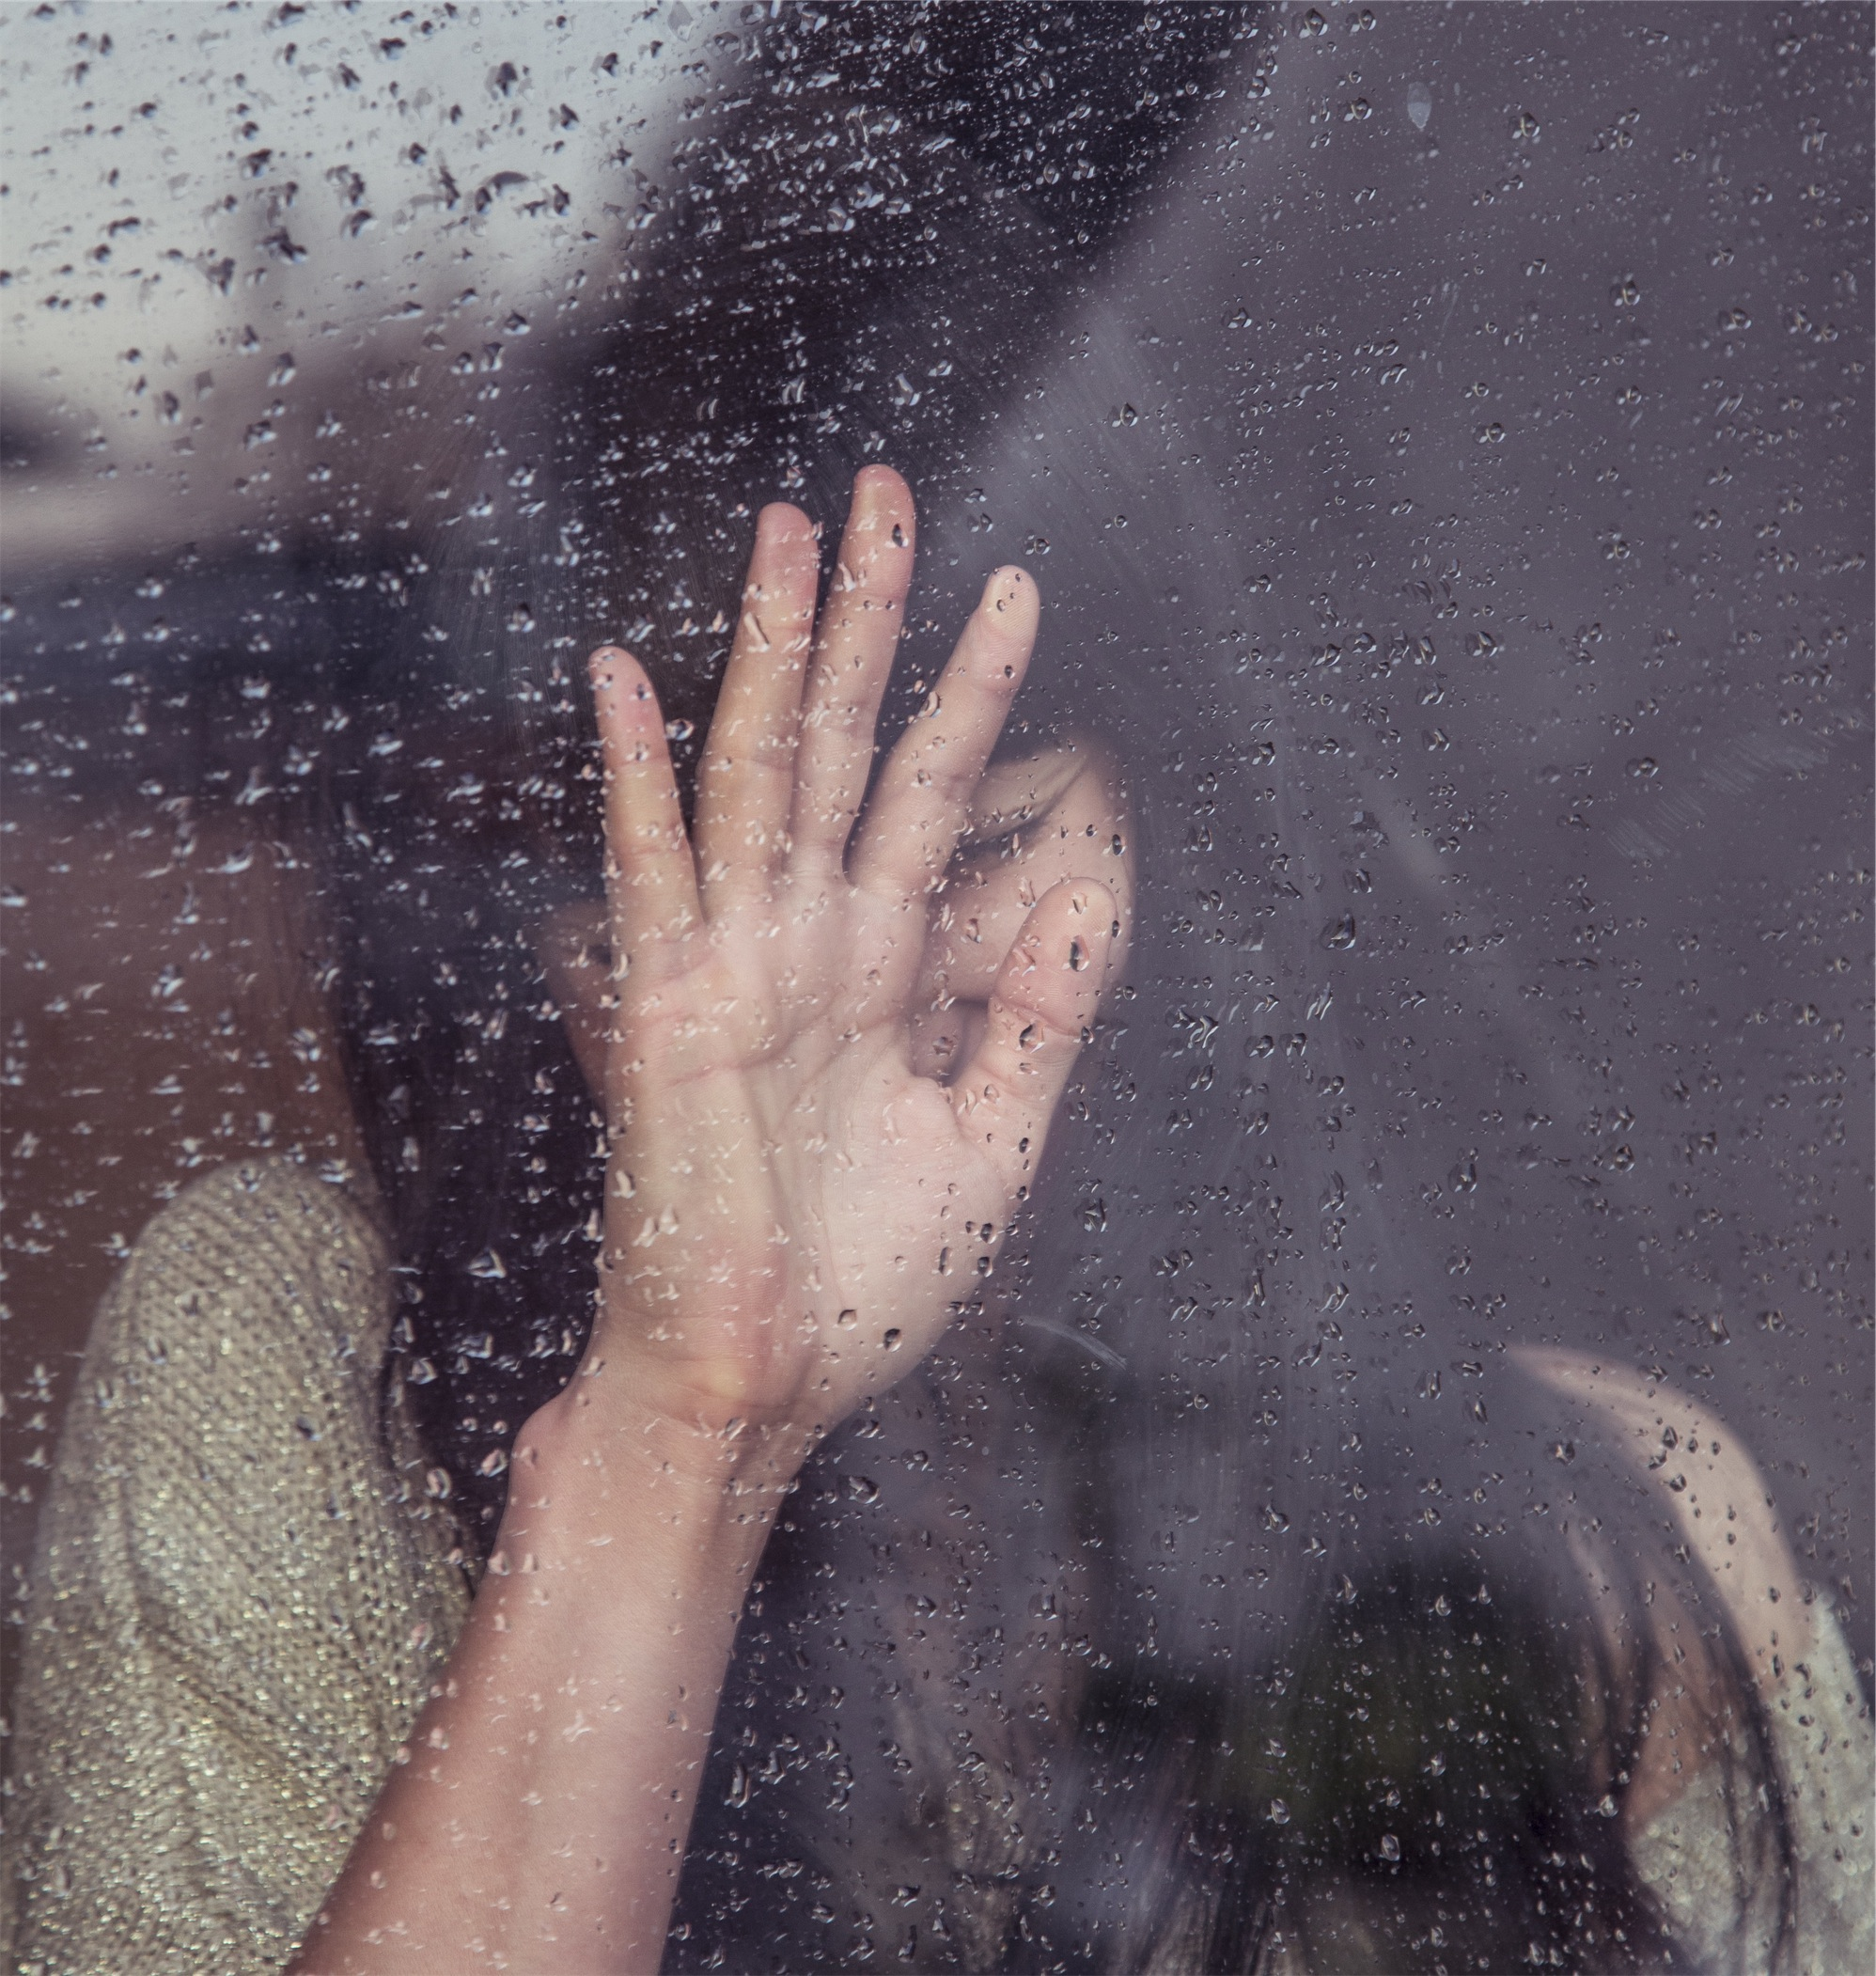 migraines_and_chronic_pain.jpg